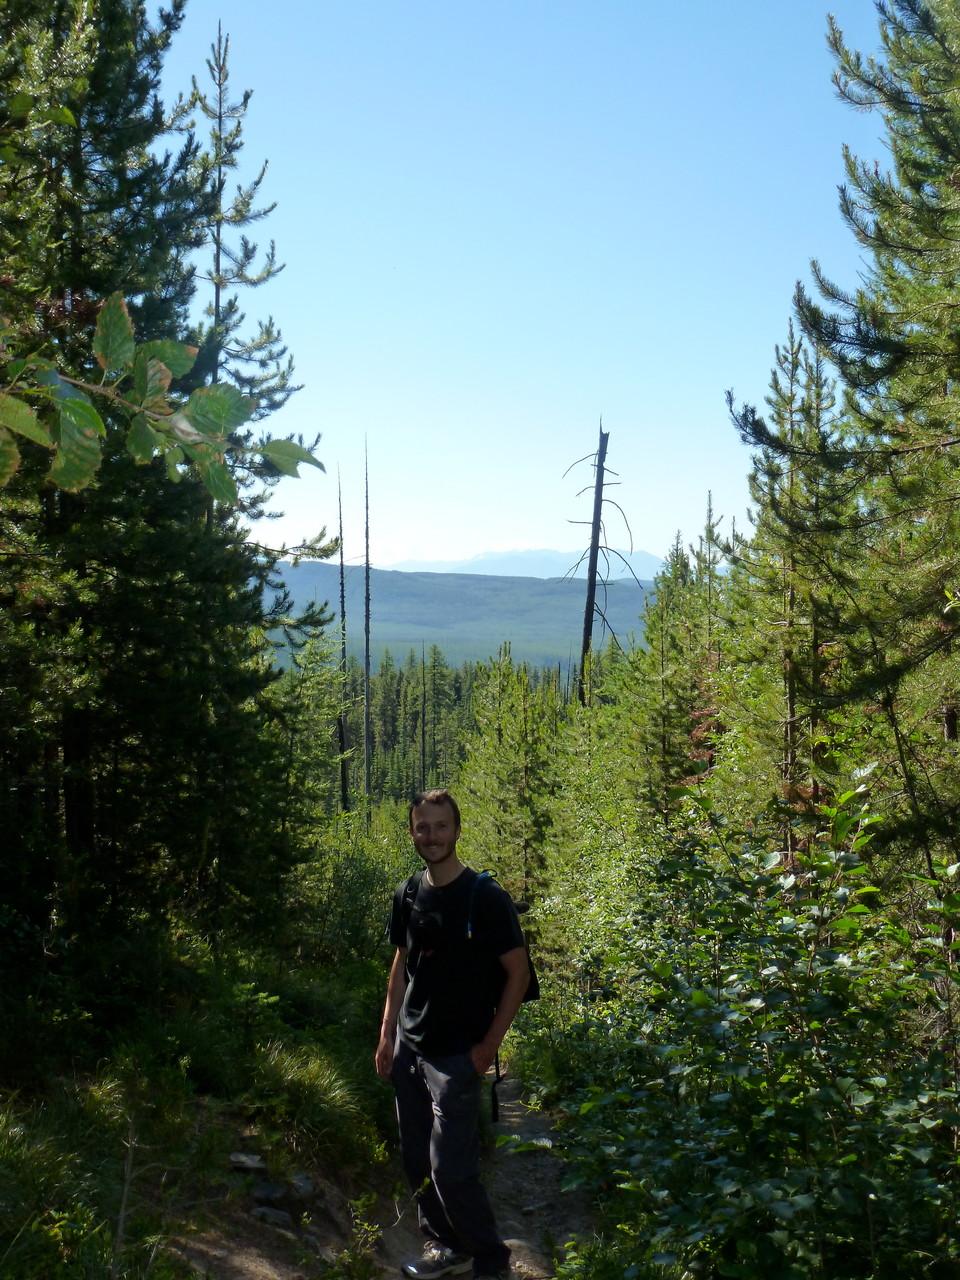 Hiked the 13 mile Quartz Lake loop